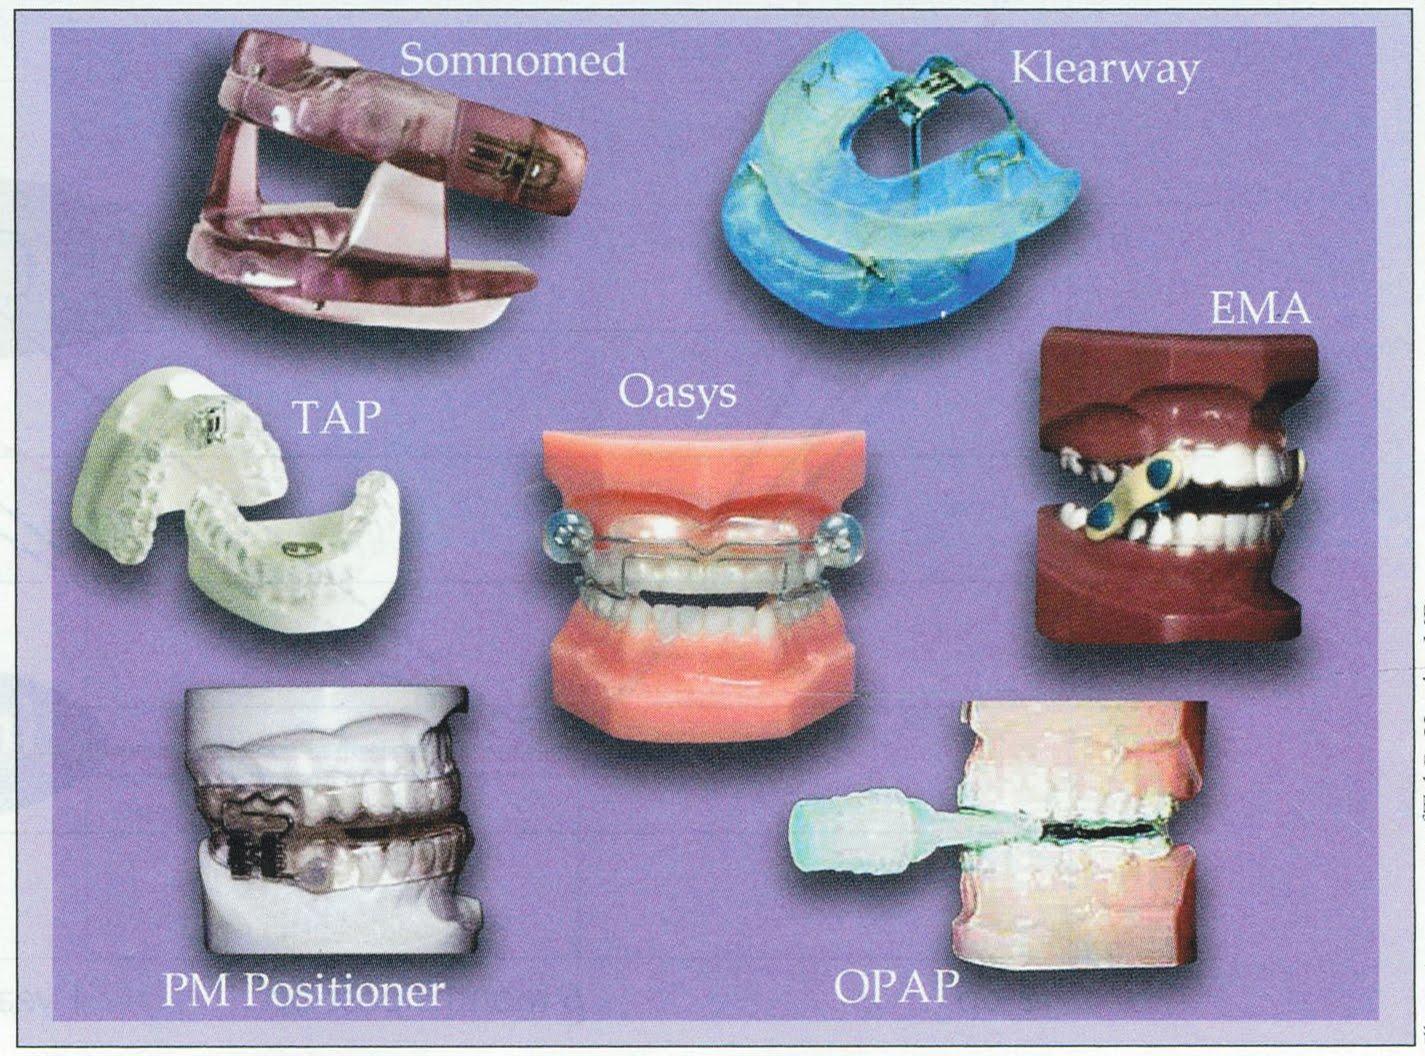 Oral Appliances to Help Correct Obstructive Sleep Apnea (OSA